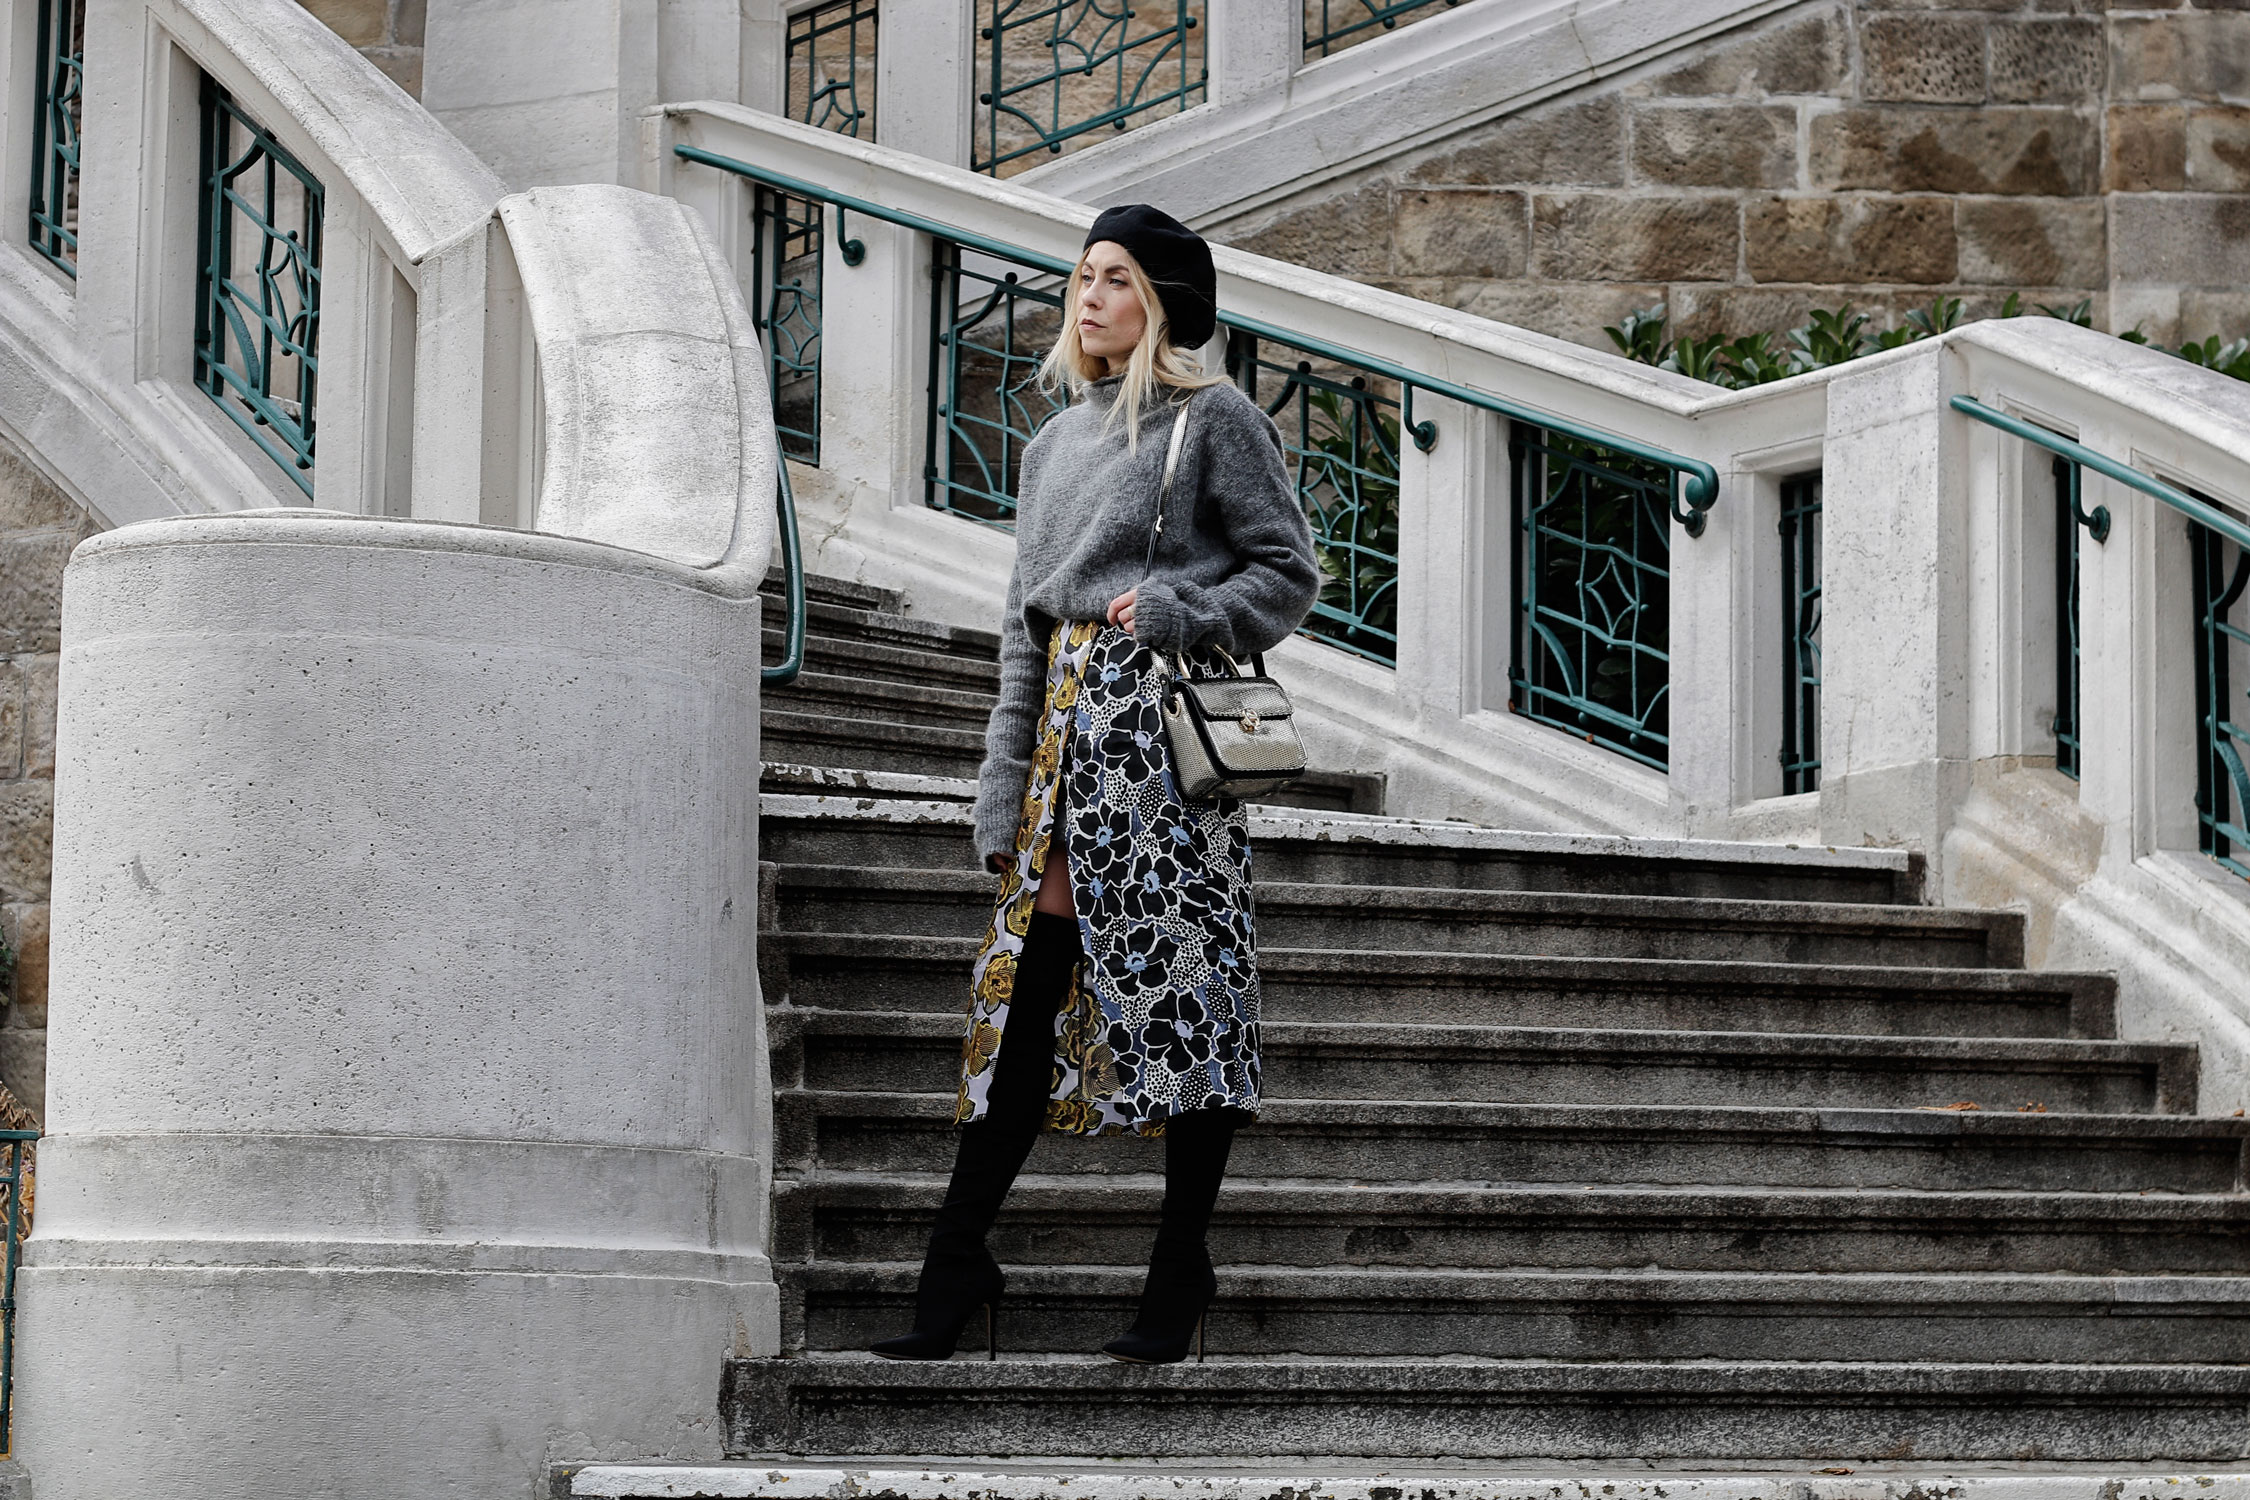 Aigner Genoveva die Trendbag der Saison - LES FACTORY FEMMES